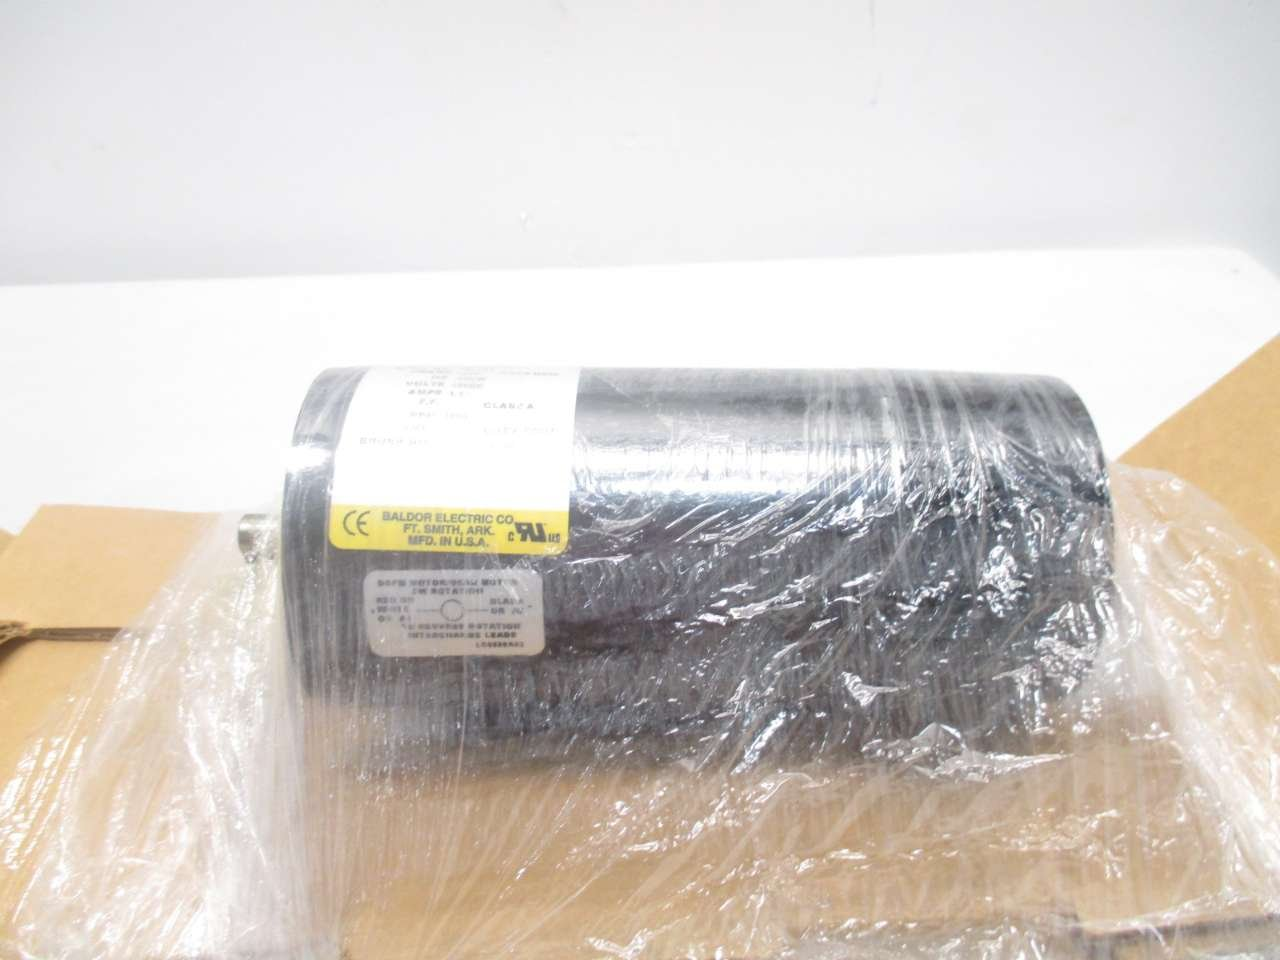 NORTON 42982 8X1-1//4 SPEED GRIP DISCS 80 GRIT NEW IN BOX 50 PCS